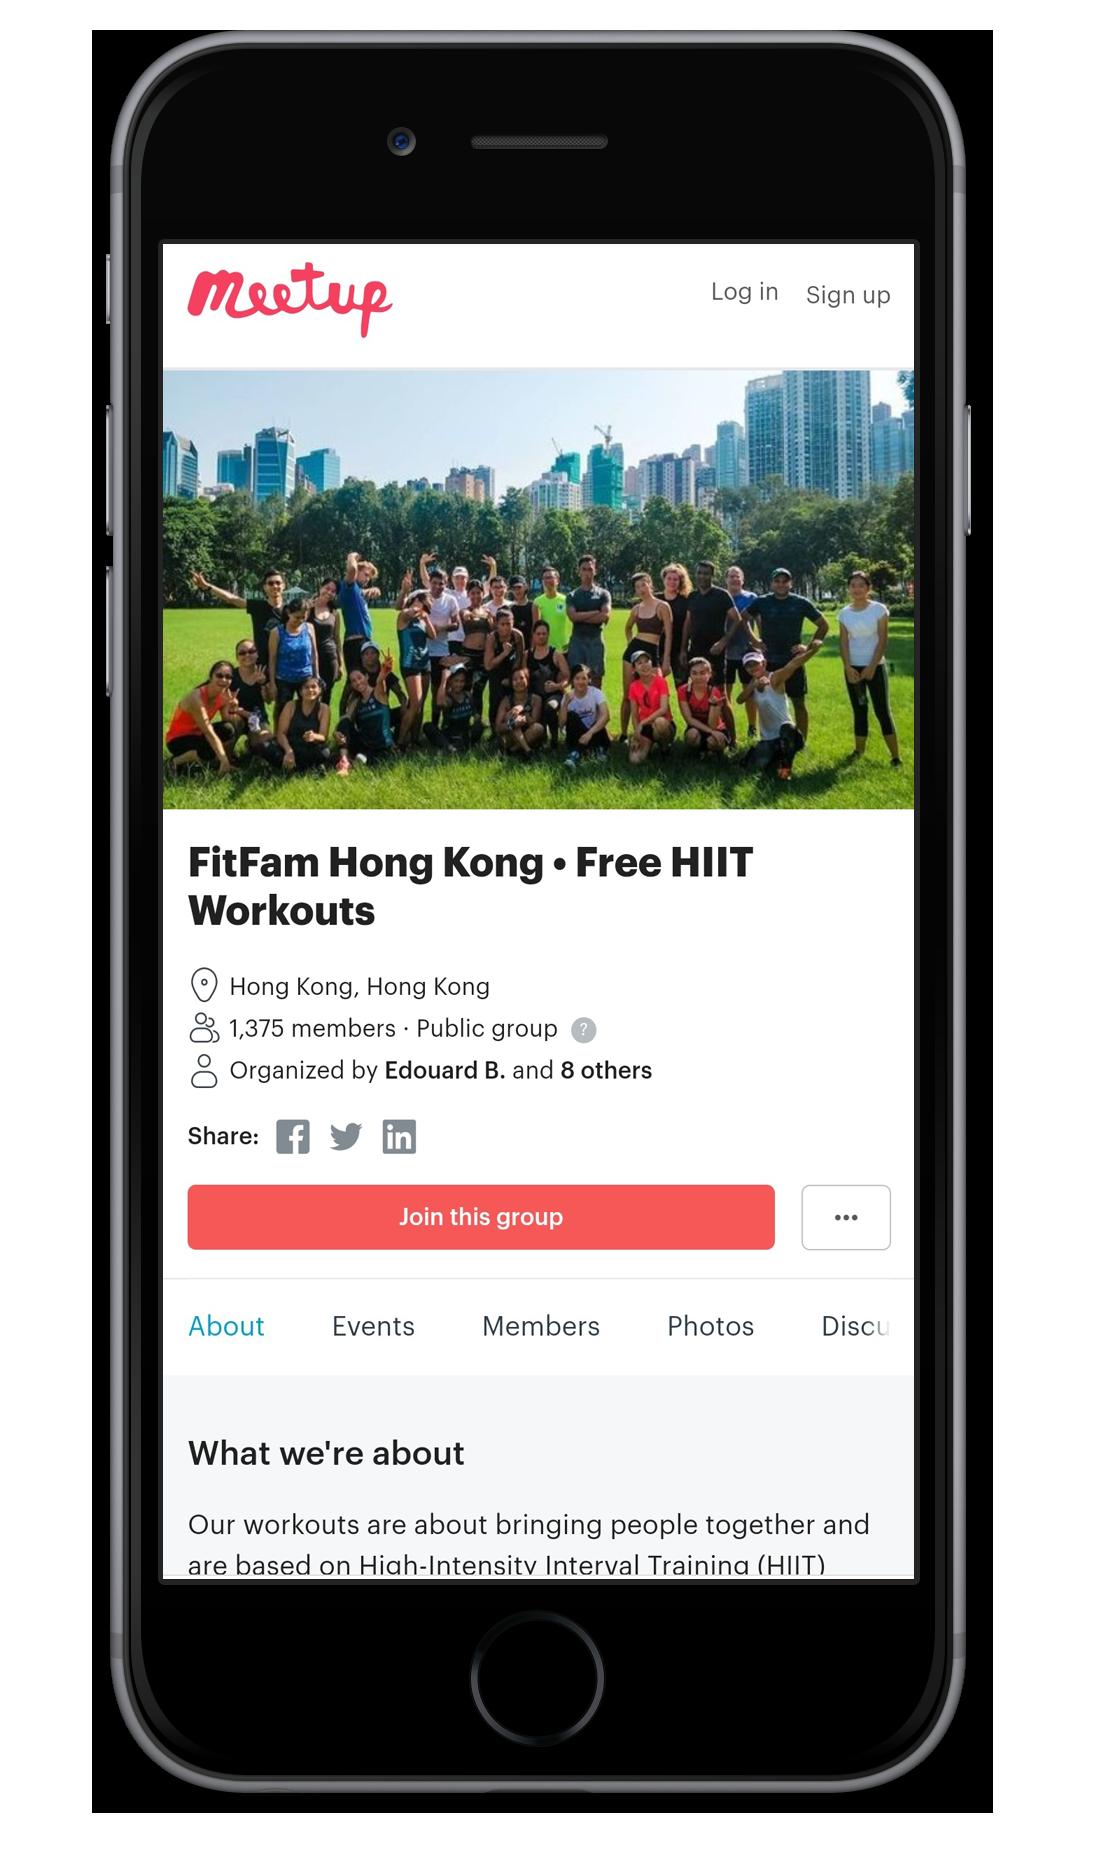 FitFam Hong Kong Meetup